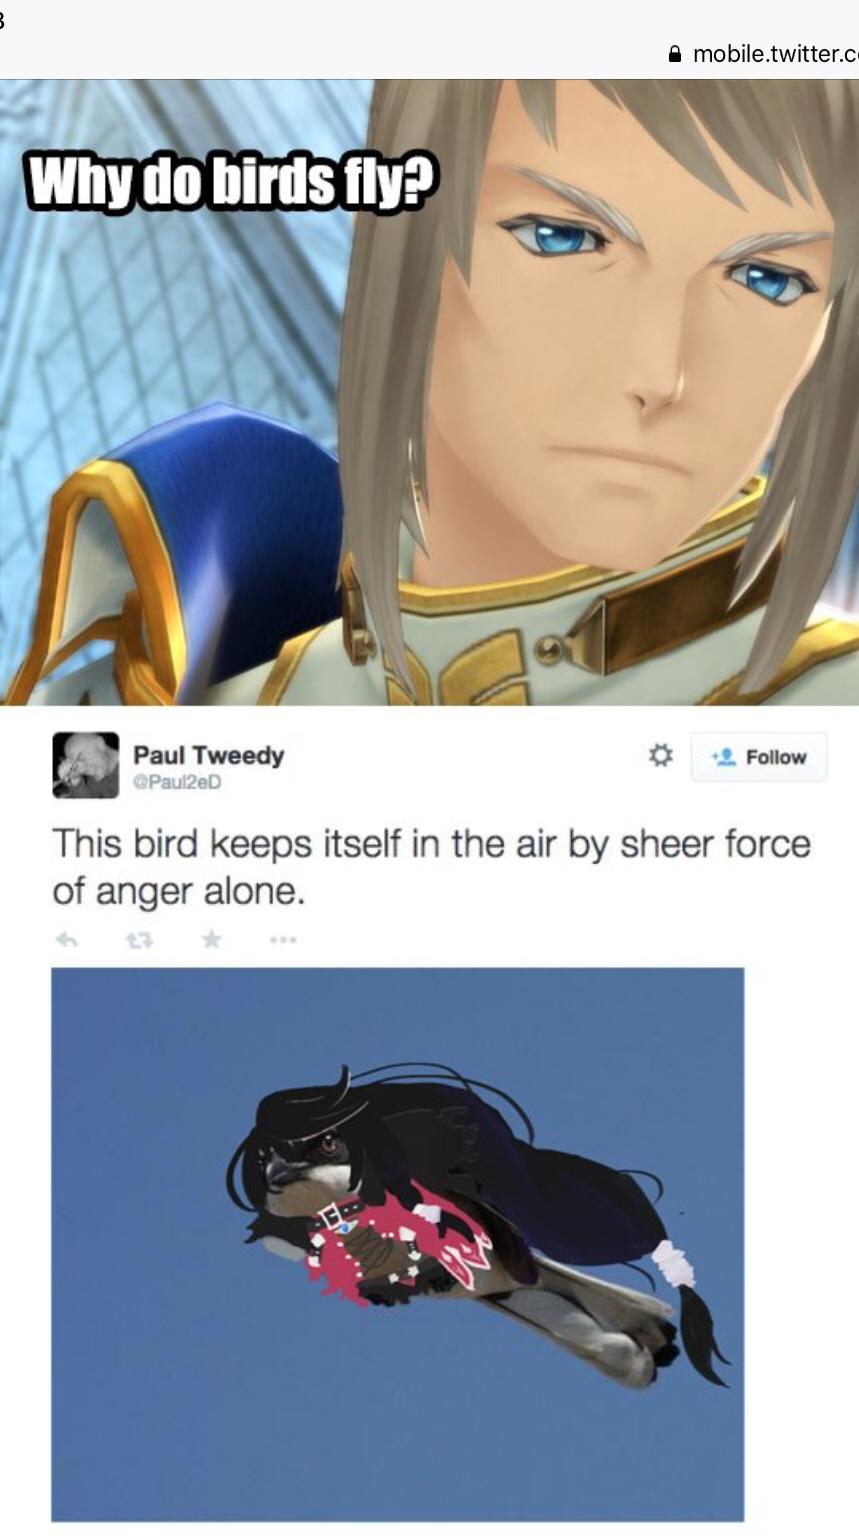 This bird needs some help killing someone.